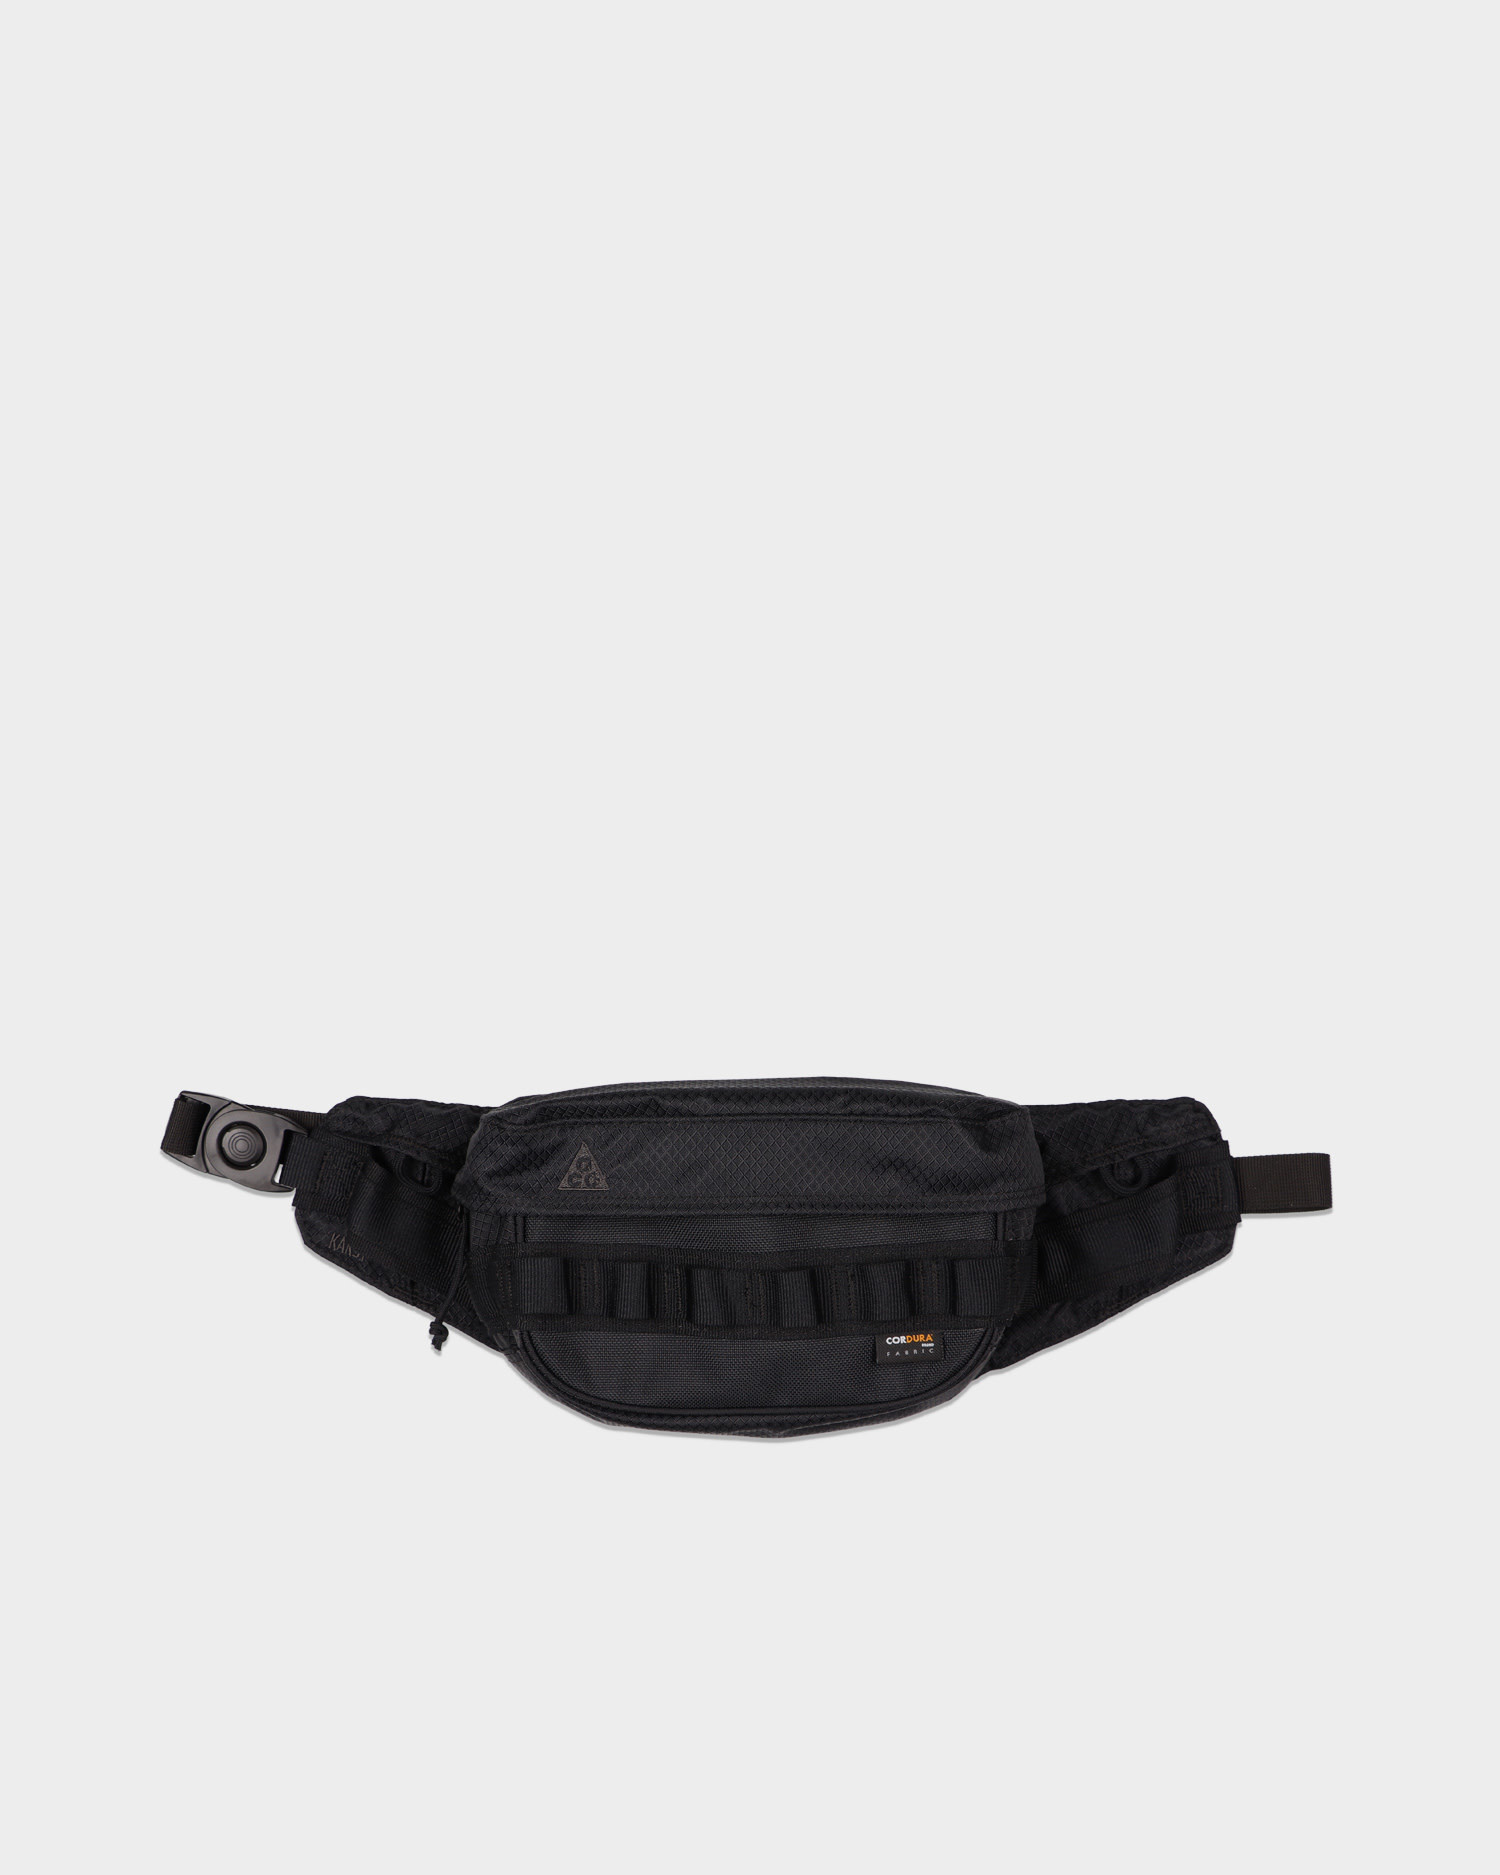 Nike ACG Karst Small Items Bag Black/Black